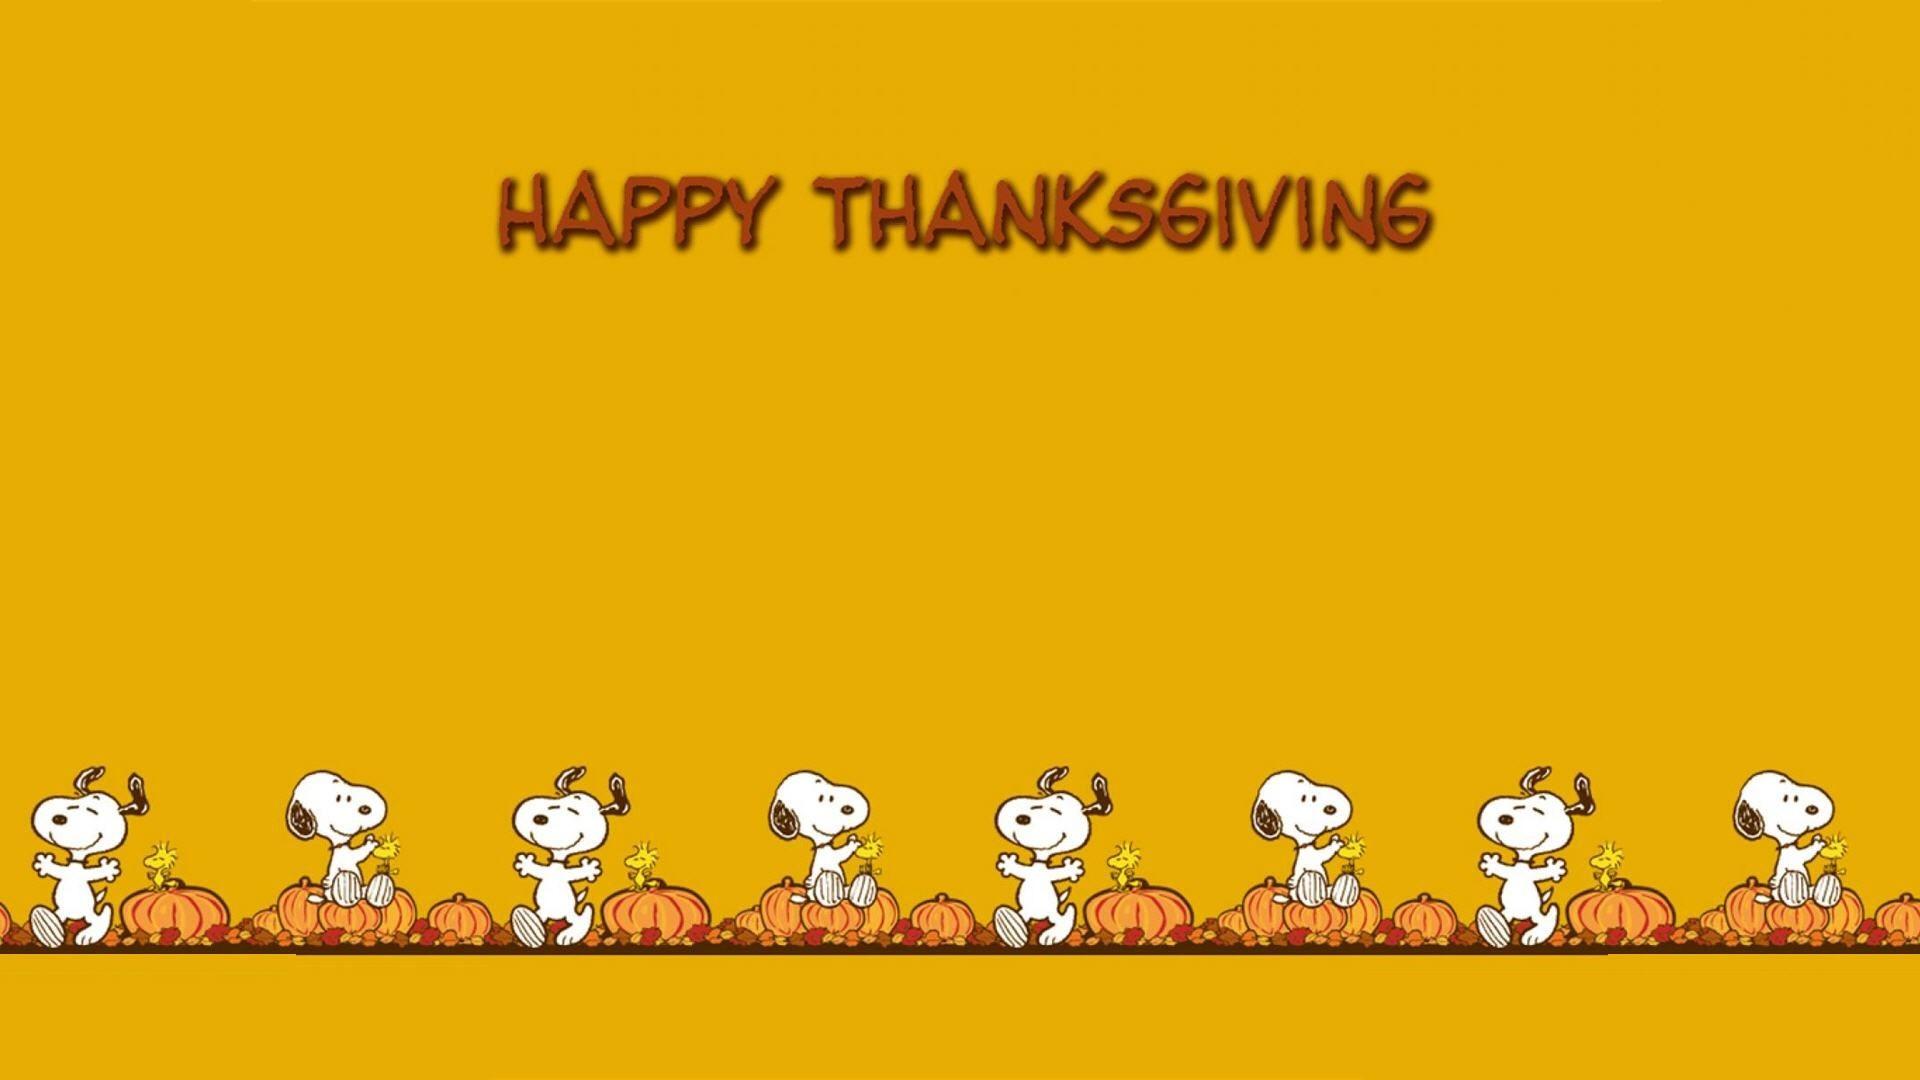 Res: 1920x1080, happy thanksgiving wallpaper desktop